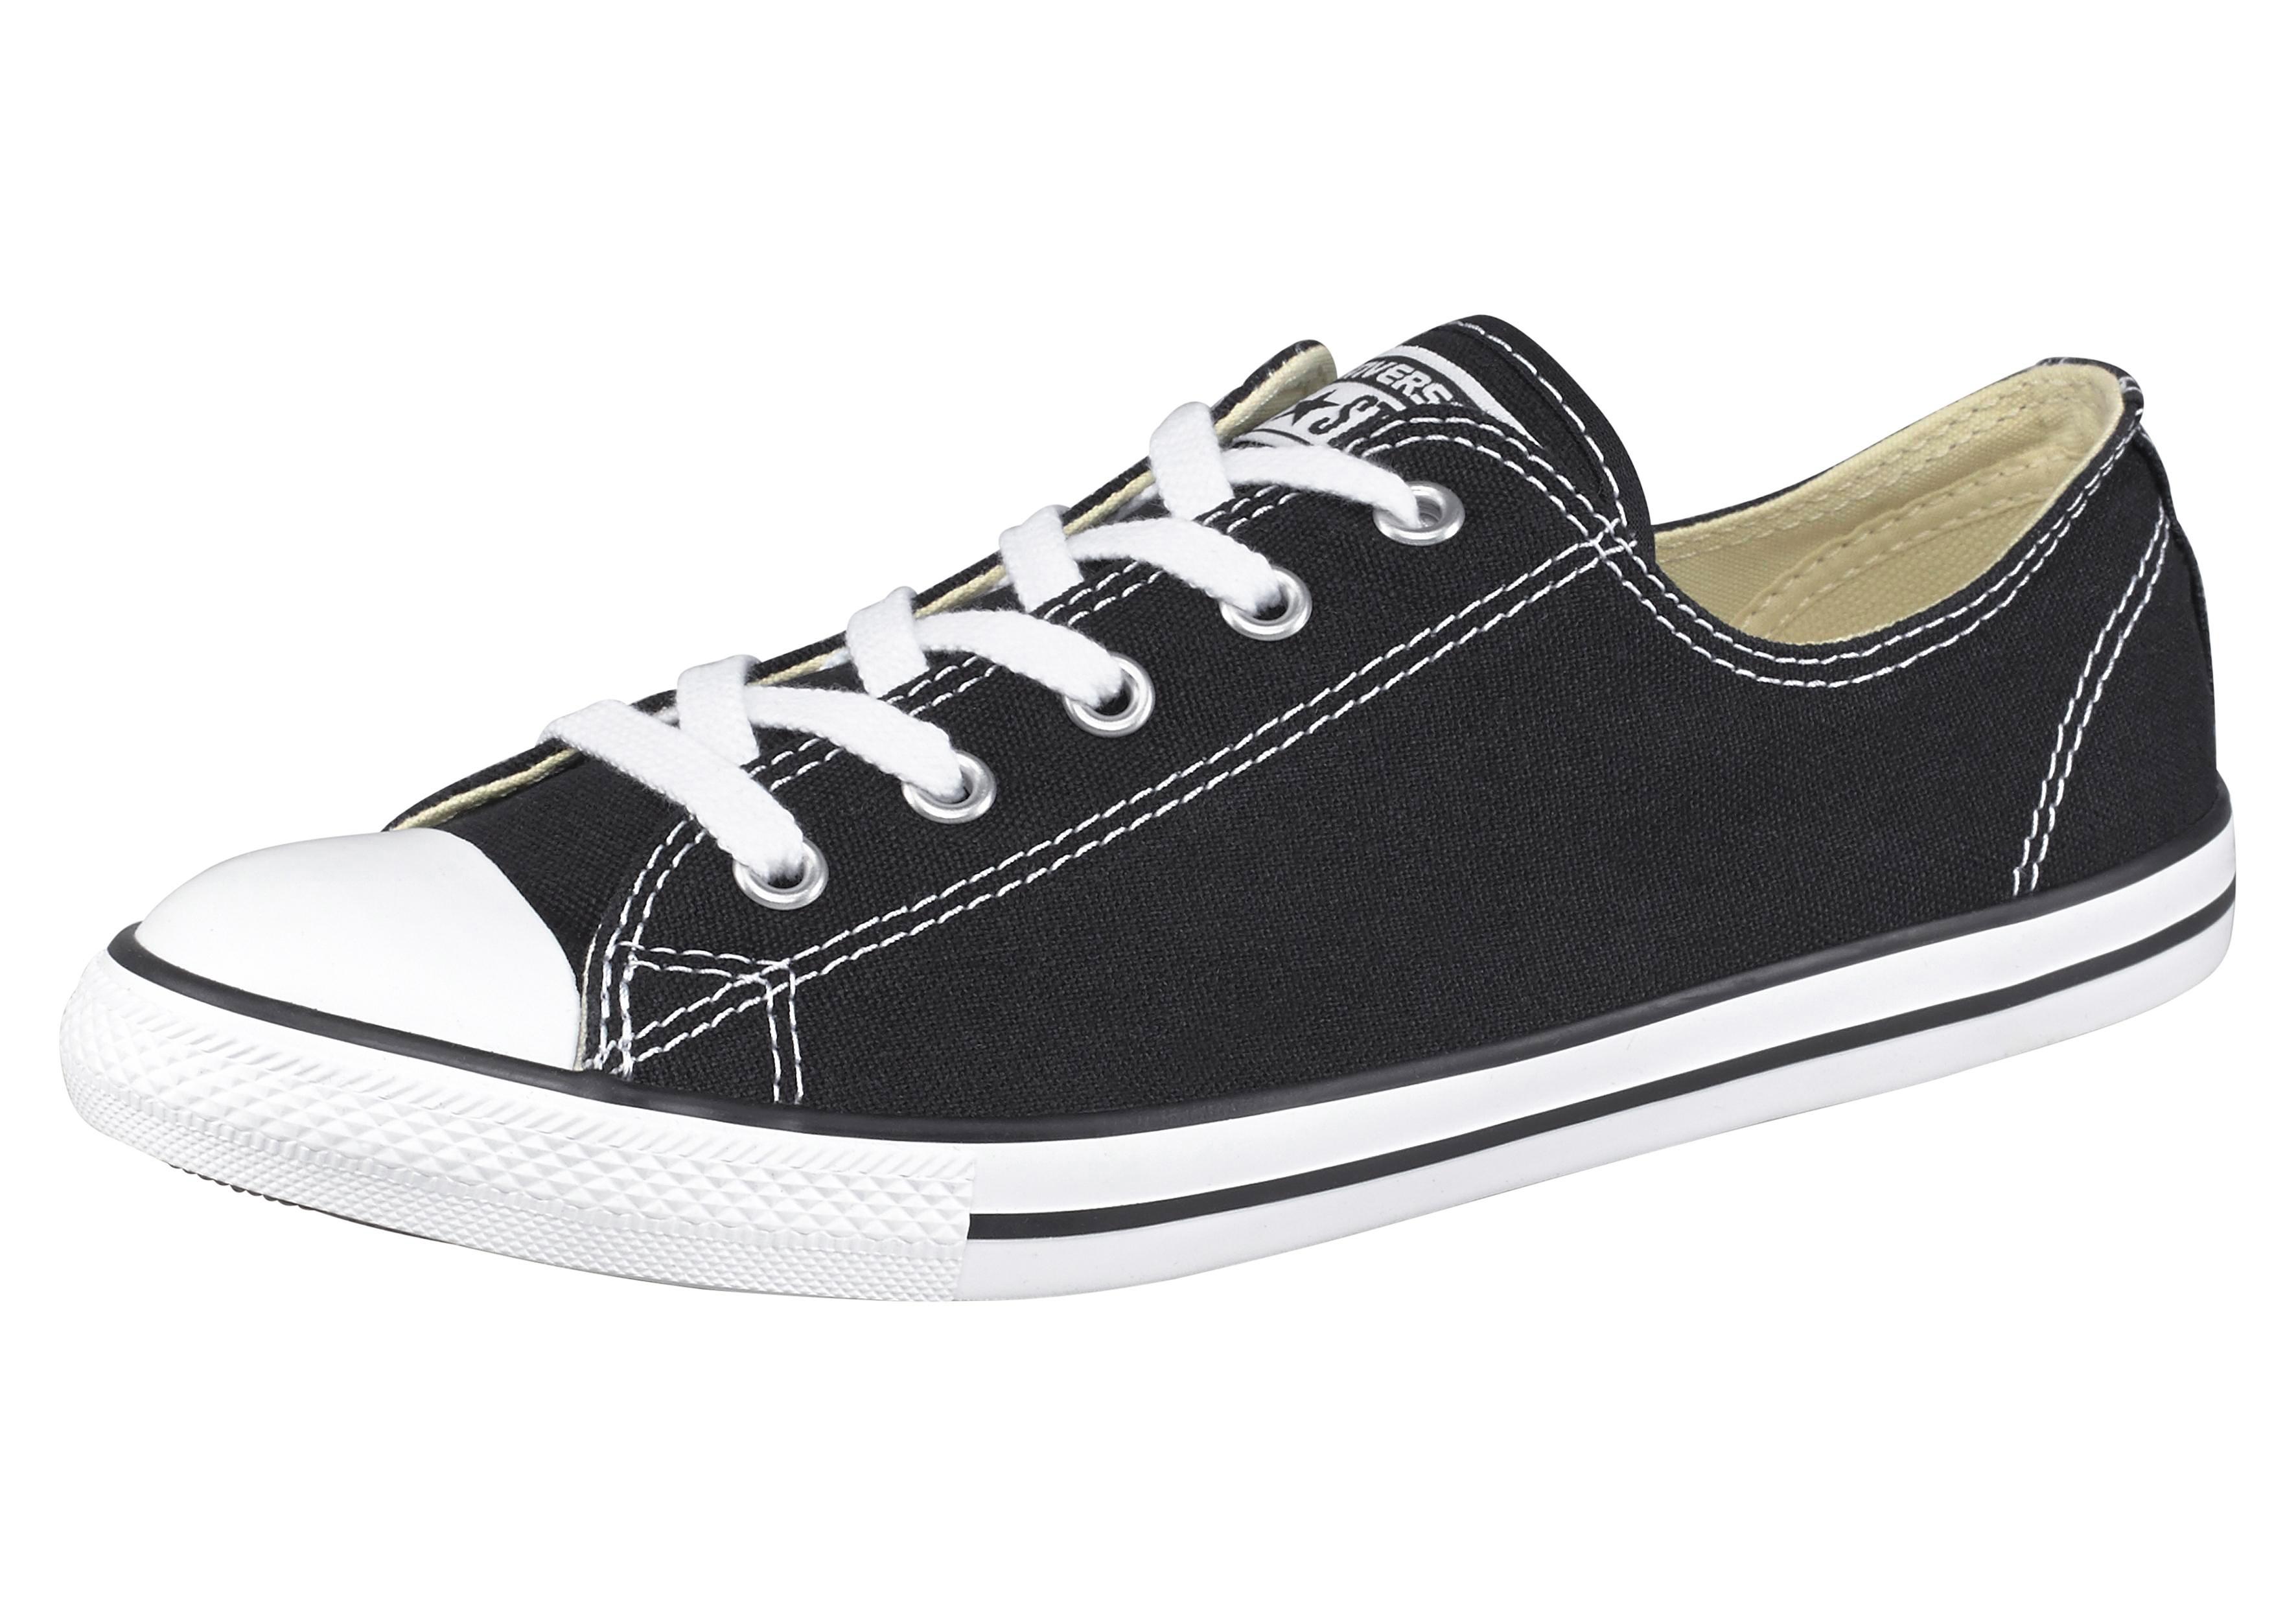 82b1a2e864c ... CT All Star Ballet Lace, CONVERSE Sneakers All Star Basic Leather,  Converse sneakers »Chuck Taylor Basic Leather Ox«, CONVERSE Sneakers in  plat model, ...